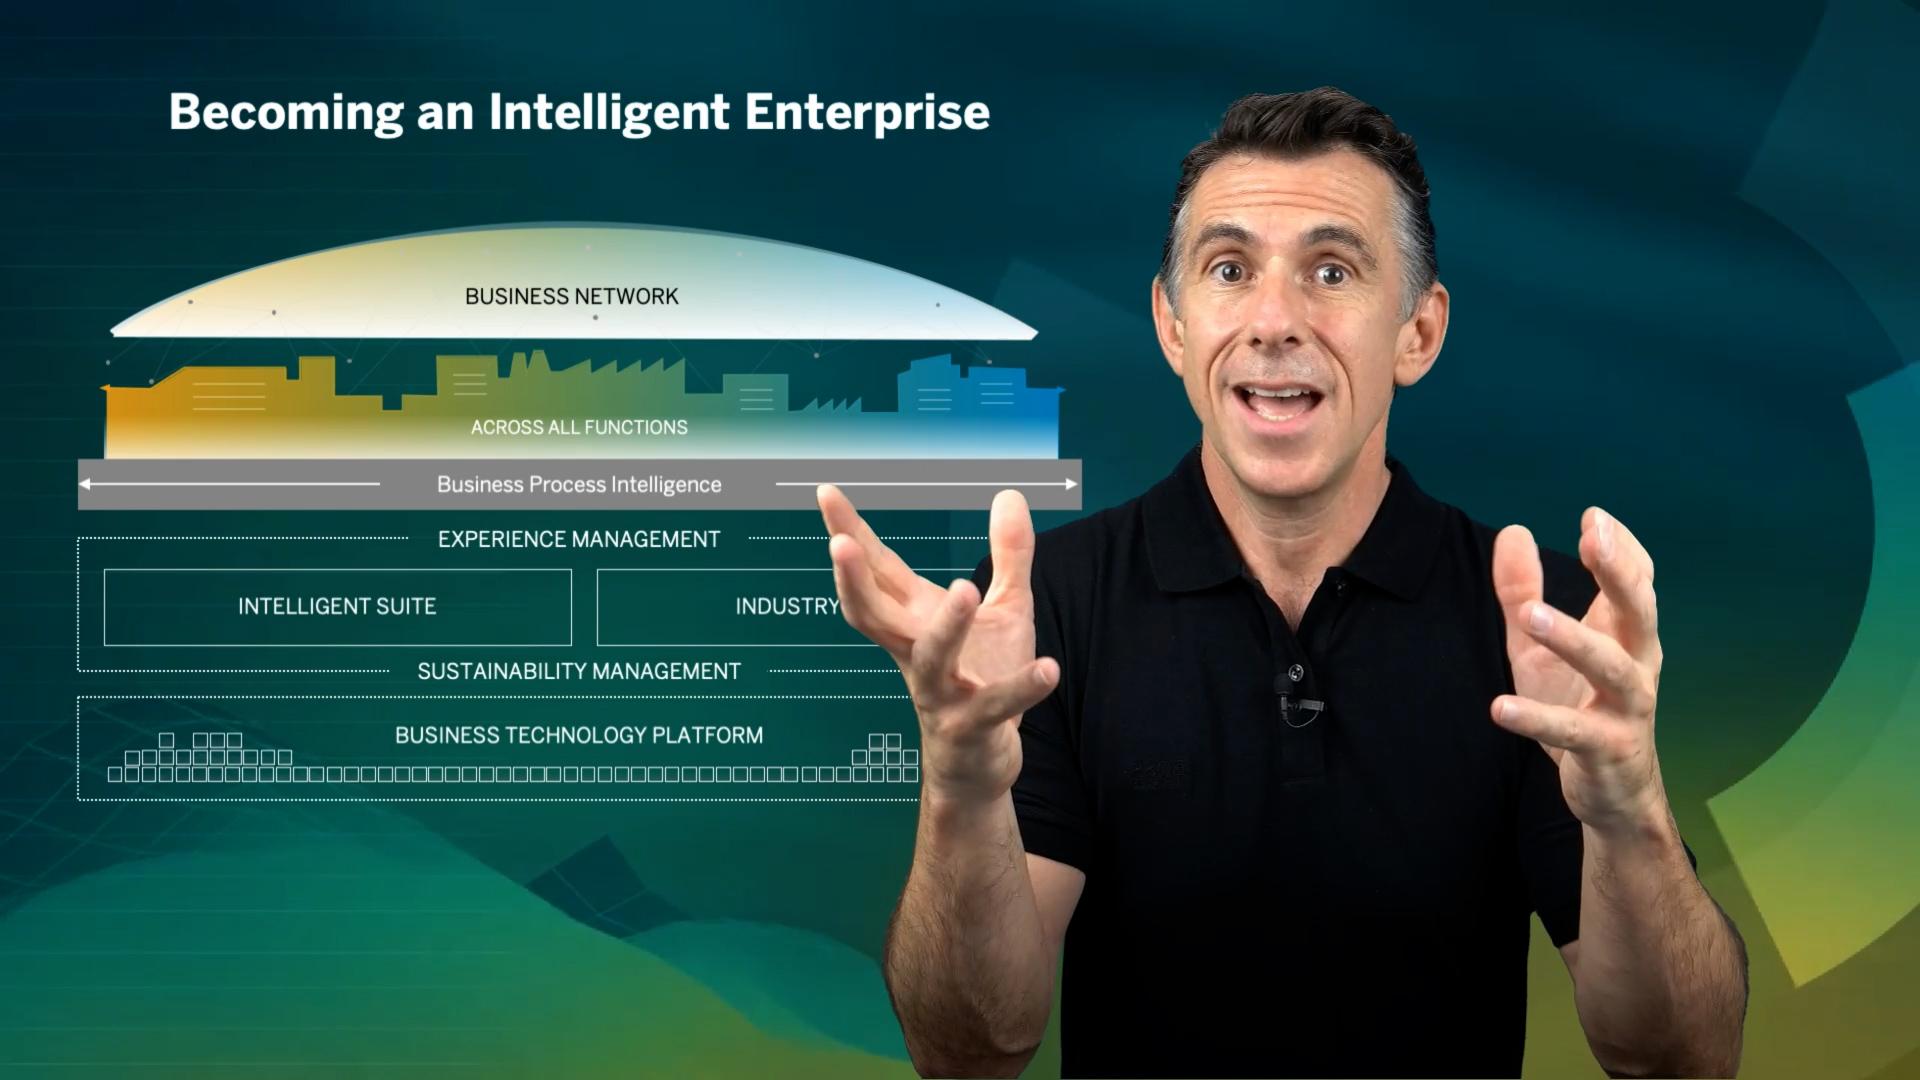 Timo Elliott presenting the intelligent enterprise marketecture